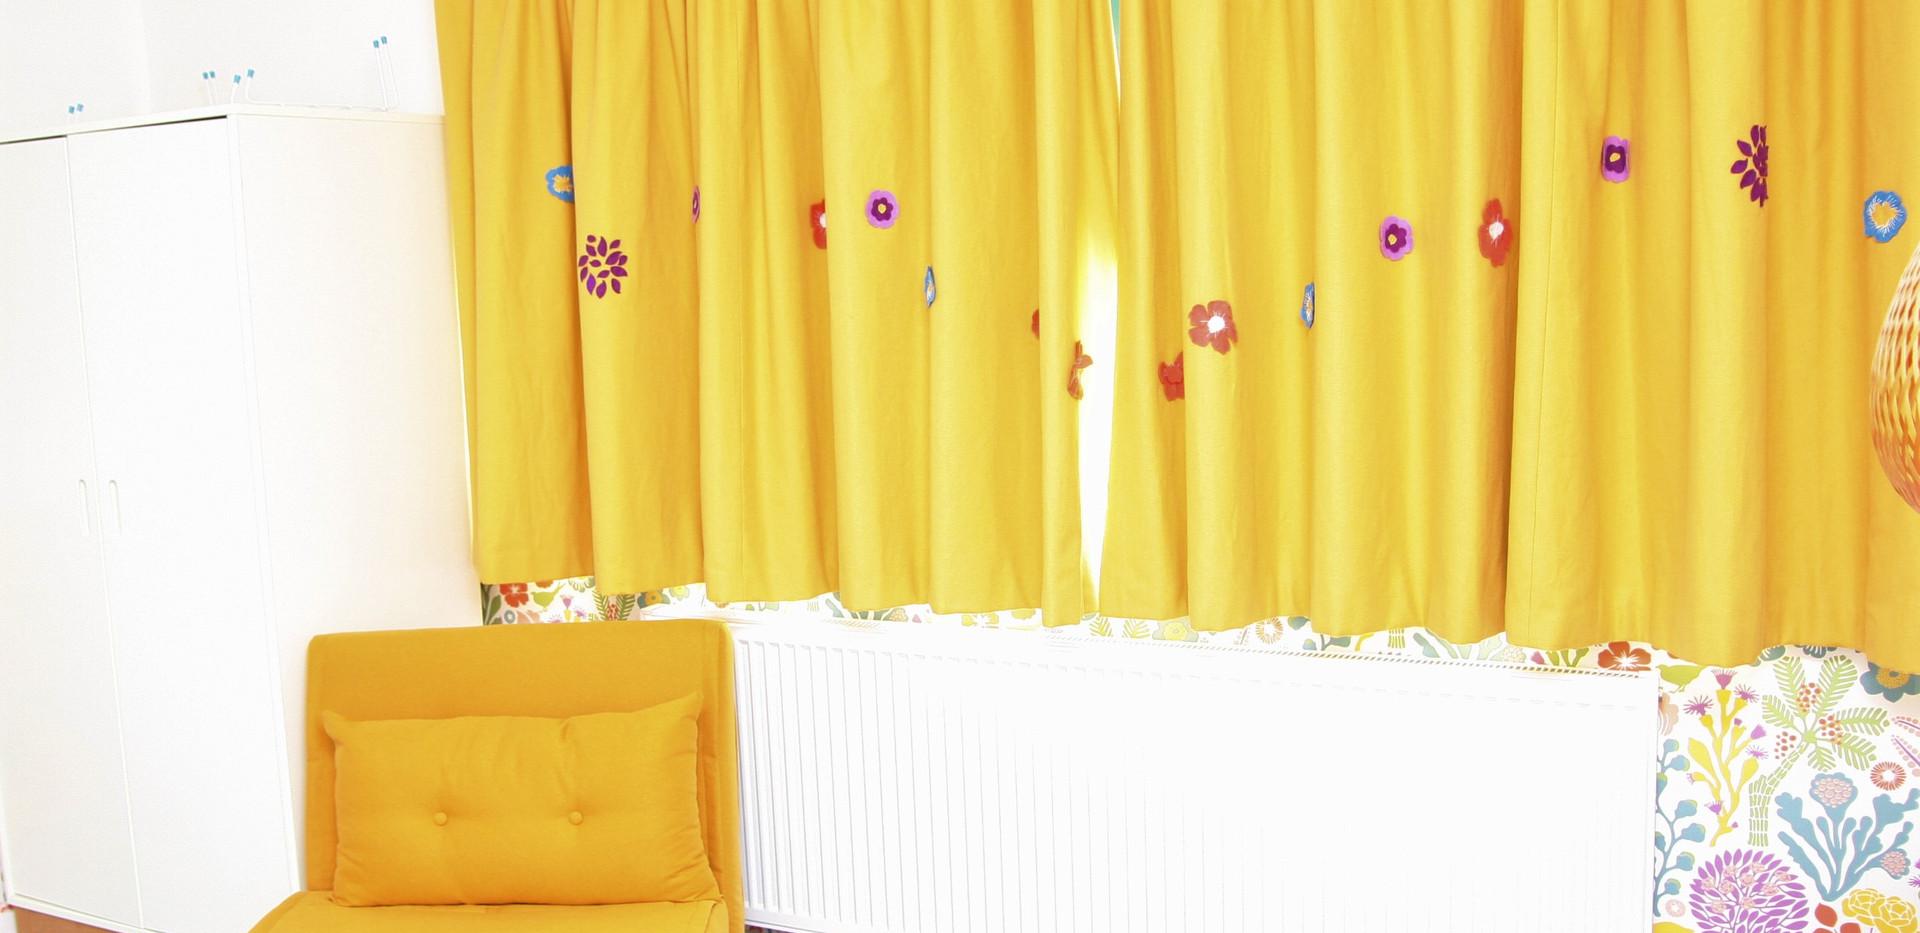 wallpaper match flowers_resize.jpg